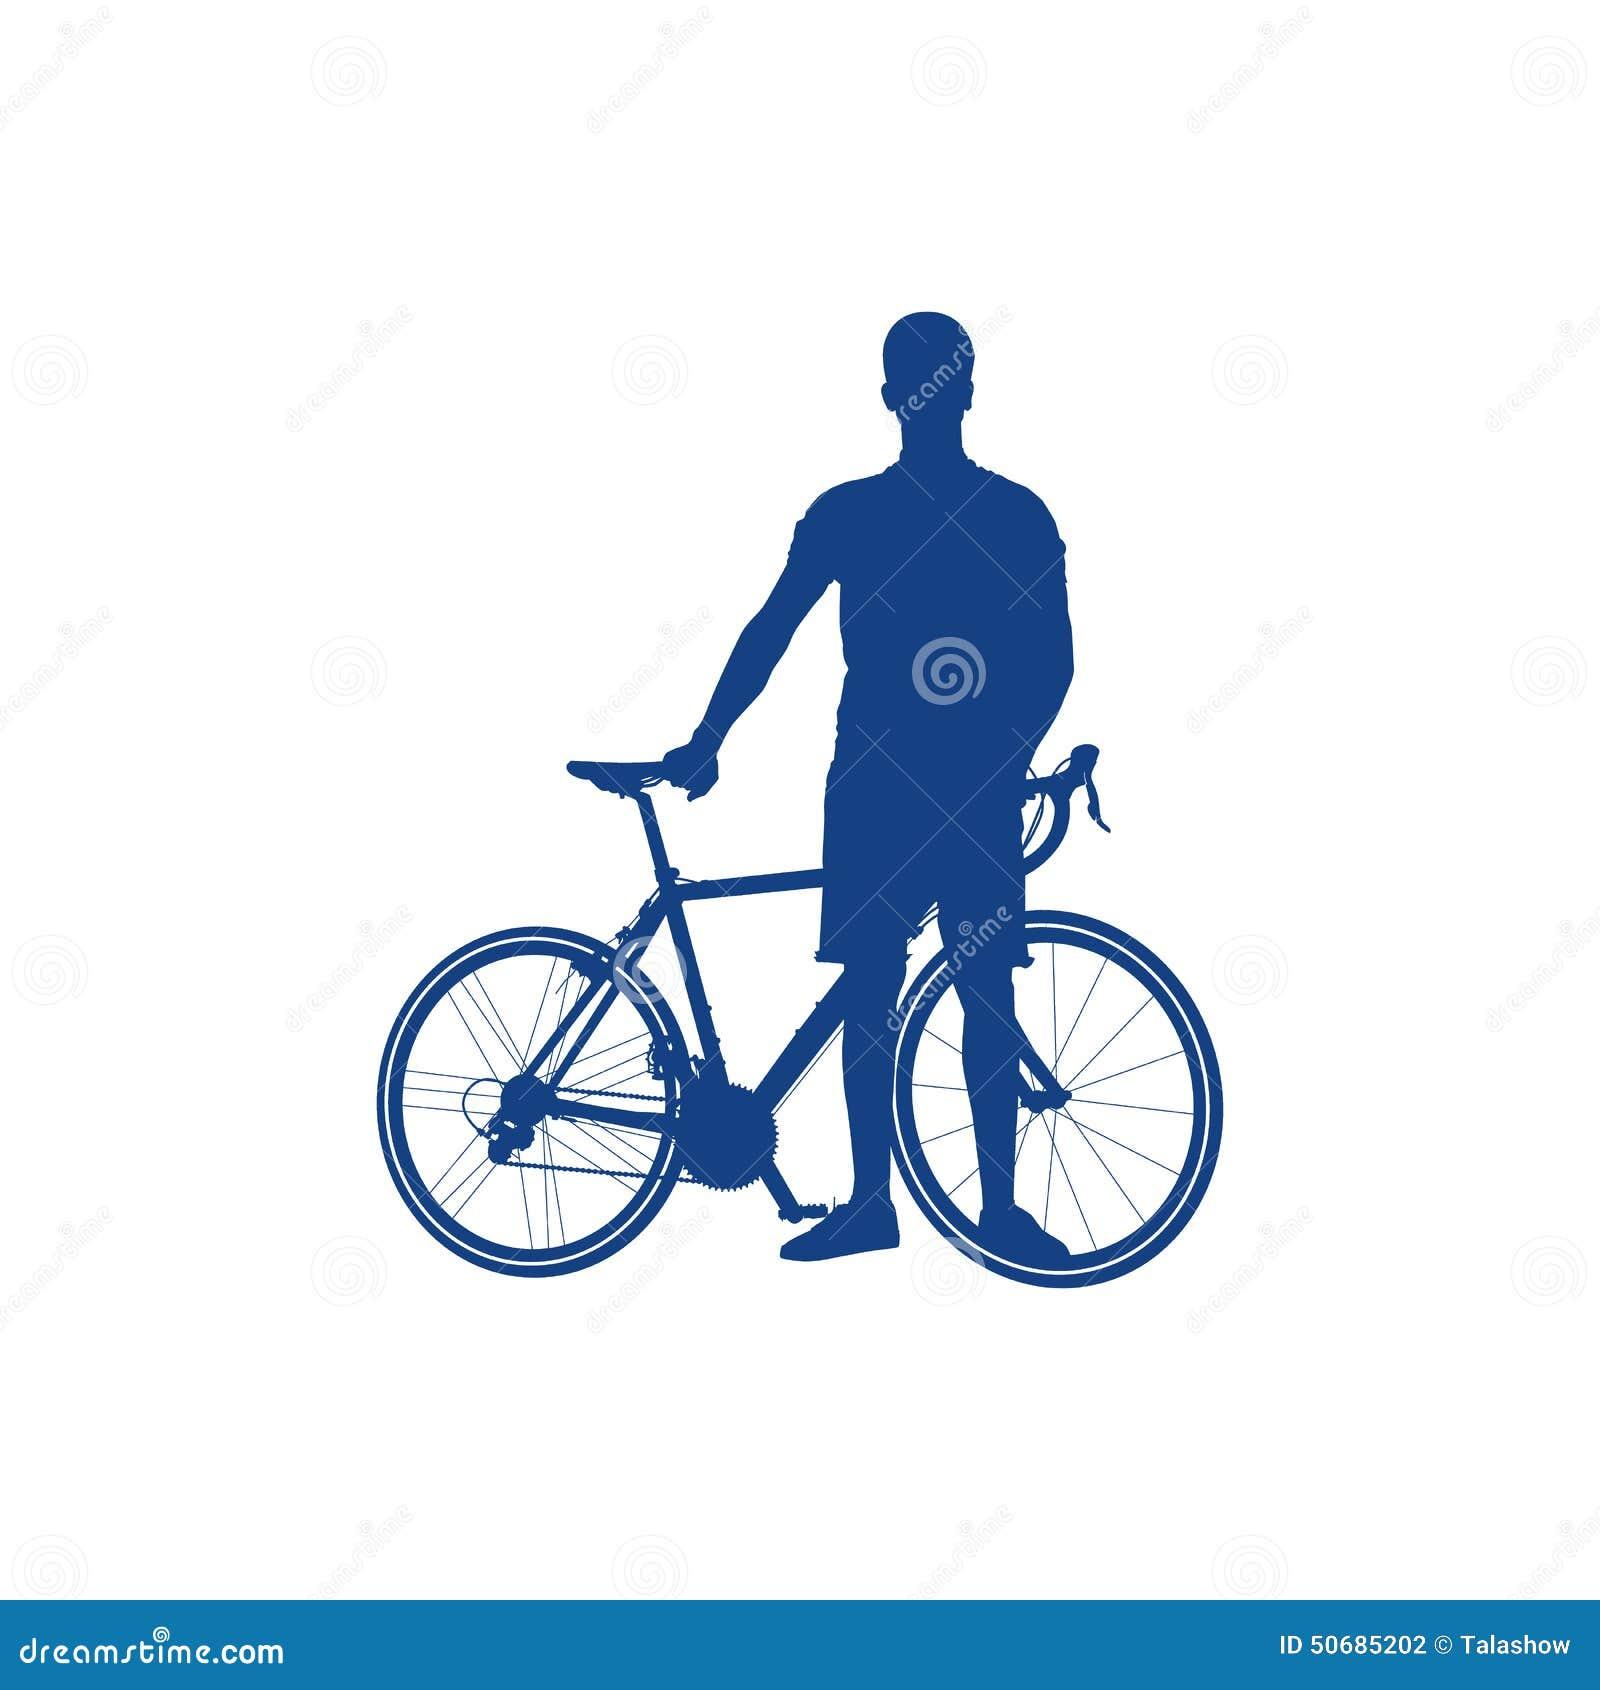 Download 骑自行车者的剪影 向量例证. 插画 包括有 自行车, 脚蹬, 行动, 比基尼泳装, 极其, 男朋友, 行程 - 50685202